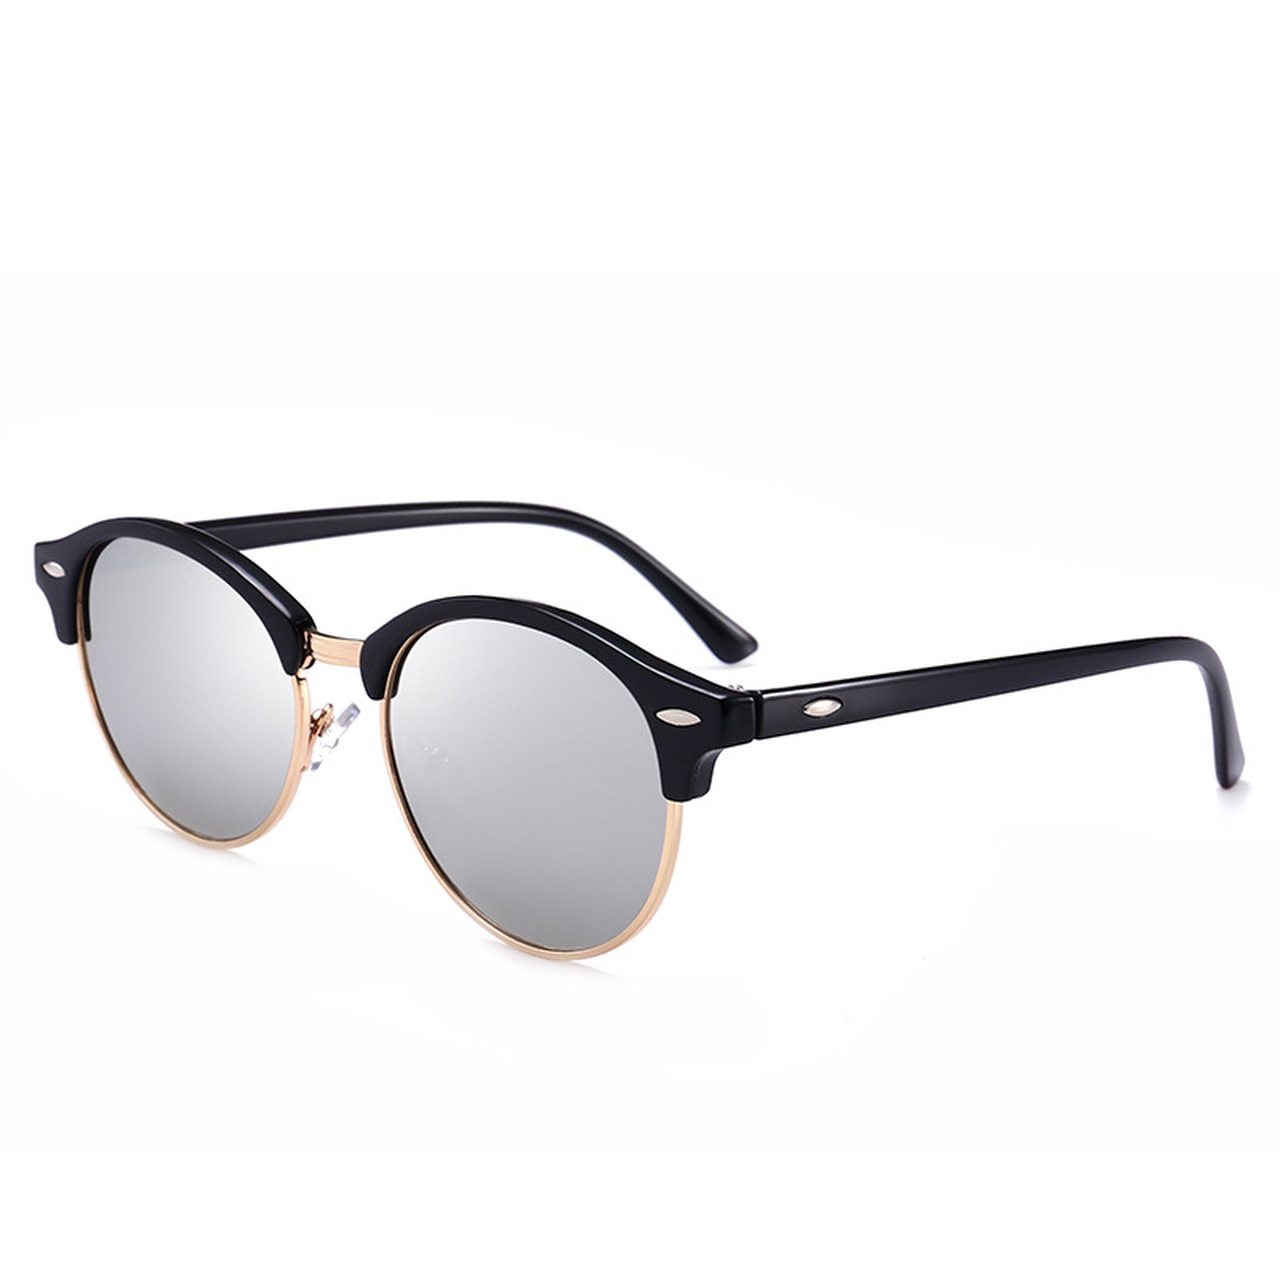 6ab4f08aaeb ... VCKA Round Polarized Sunglasses Women Brand Designer 2018 Luxury  Vintage Sun Glasses Men mirror UV400 Shades ...